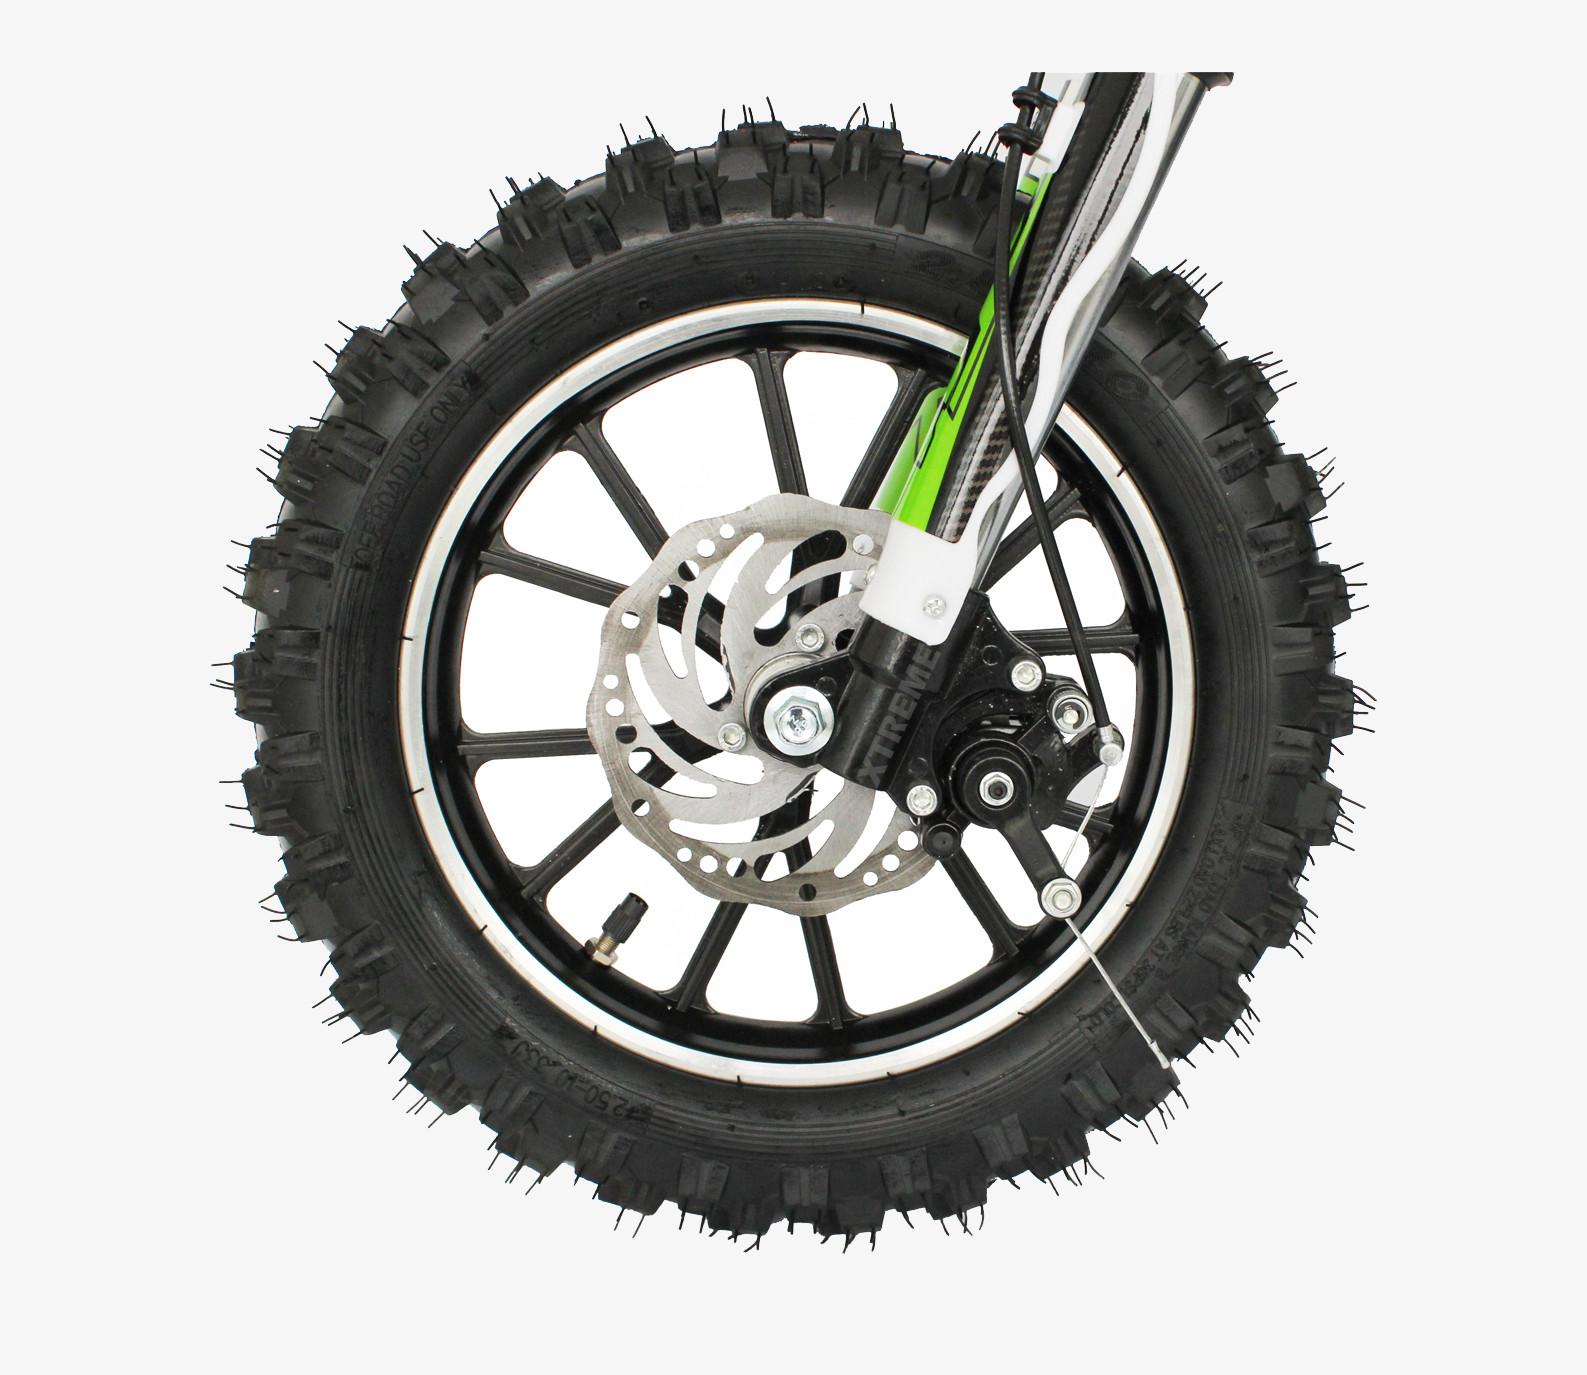 MINI DIRT BIKE XTM MOTOR BIKE COMPLETE FRONT WHEEL